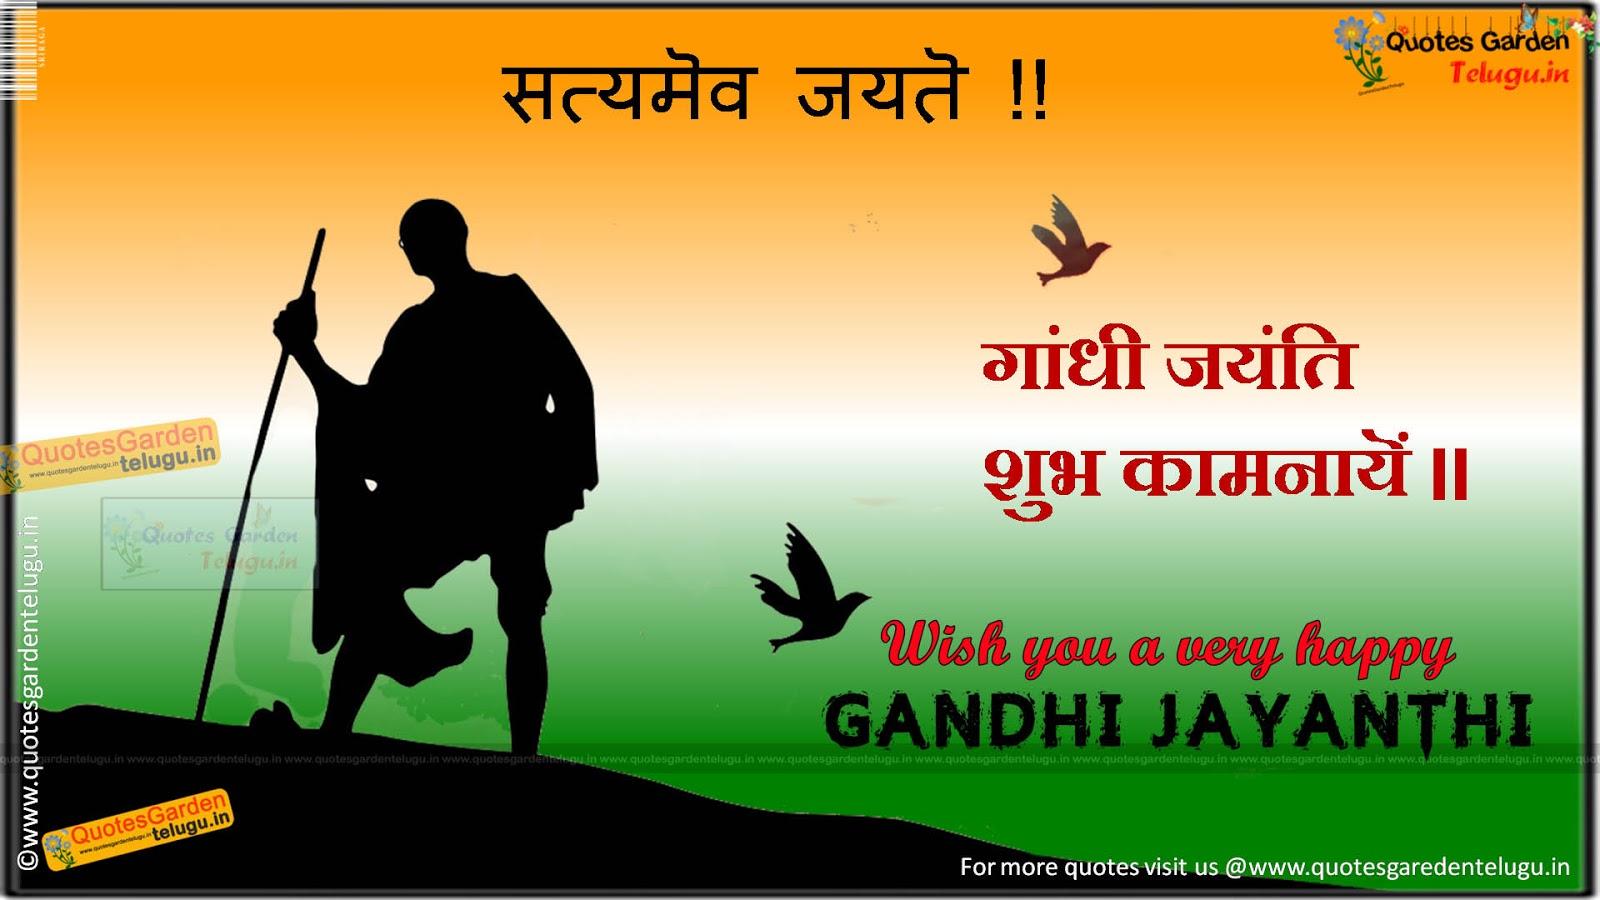 Best Gandhi Jayanti 2015 Greetings Quotes Wallpapers In Hindi